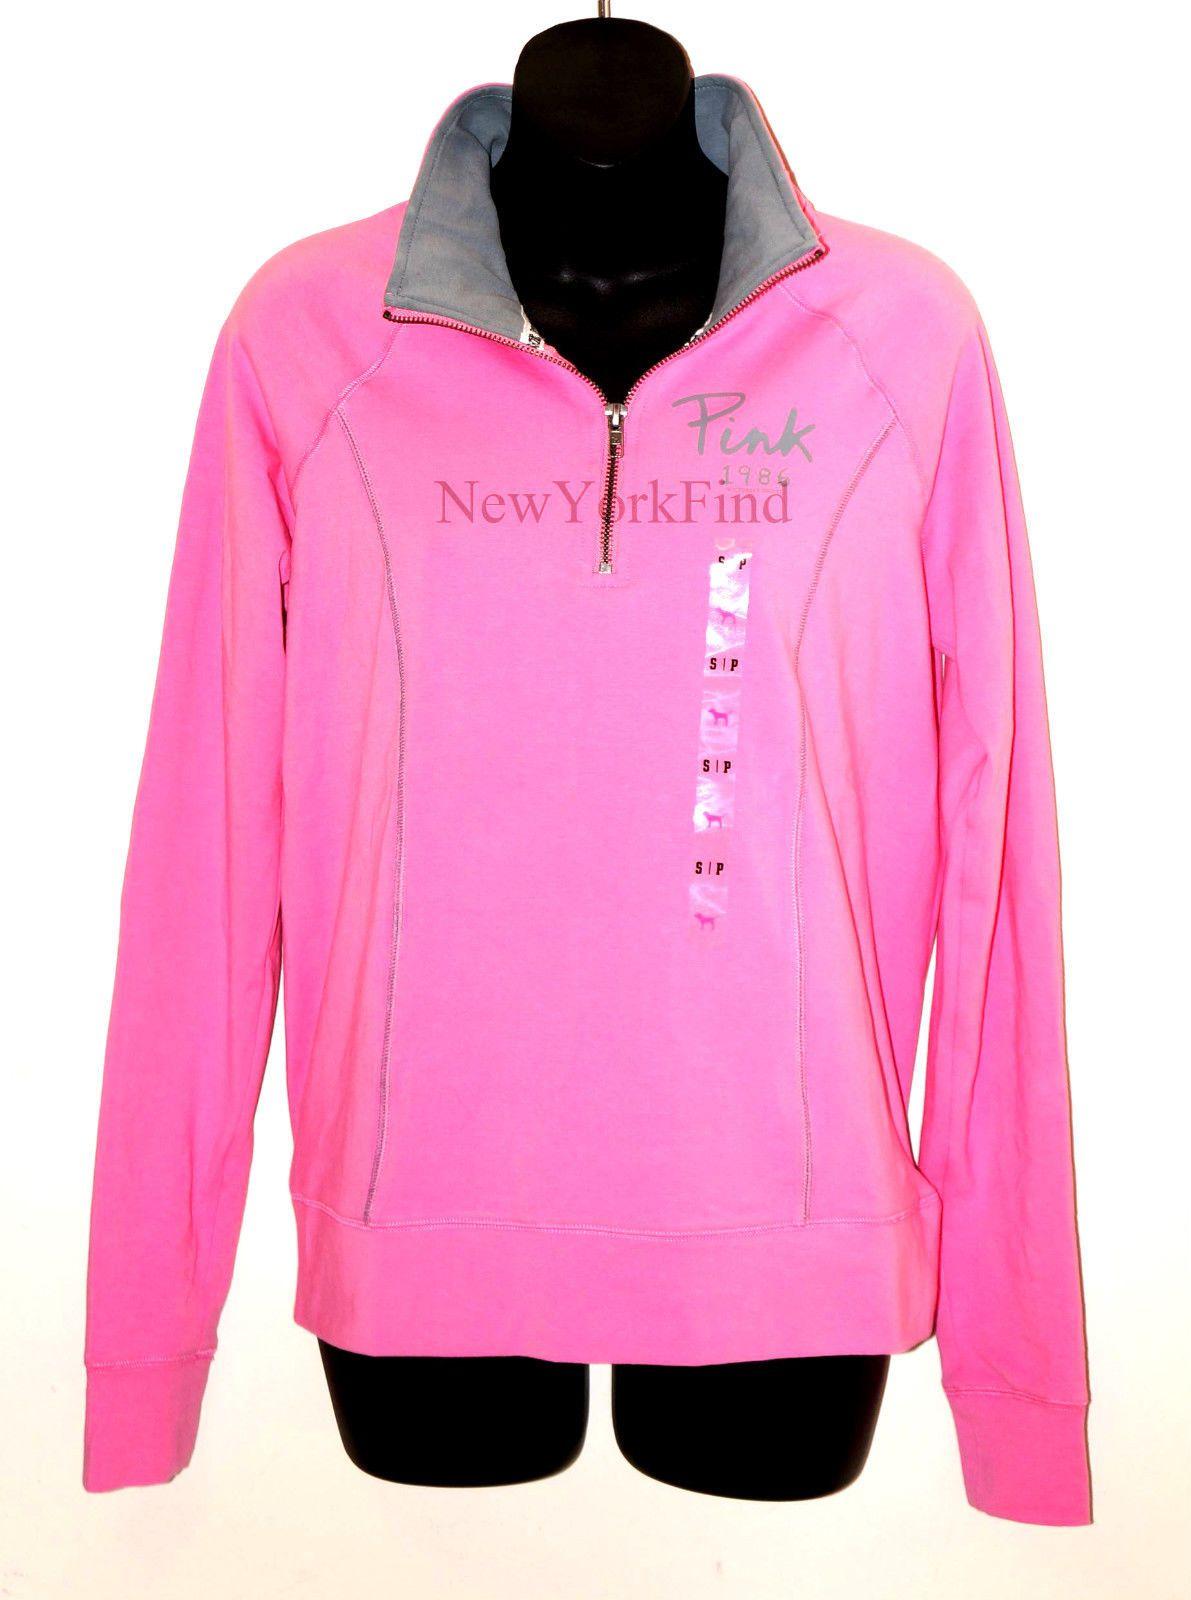 Nwt Victoria's Secret Love Pink Jacket Half Zip Sweater Shirt Yoga ...